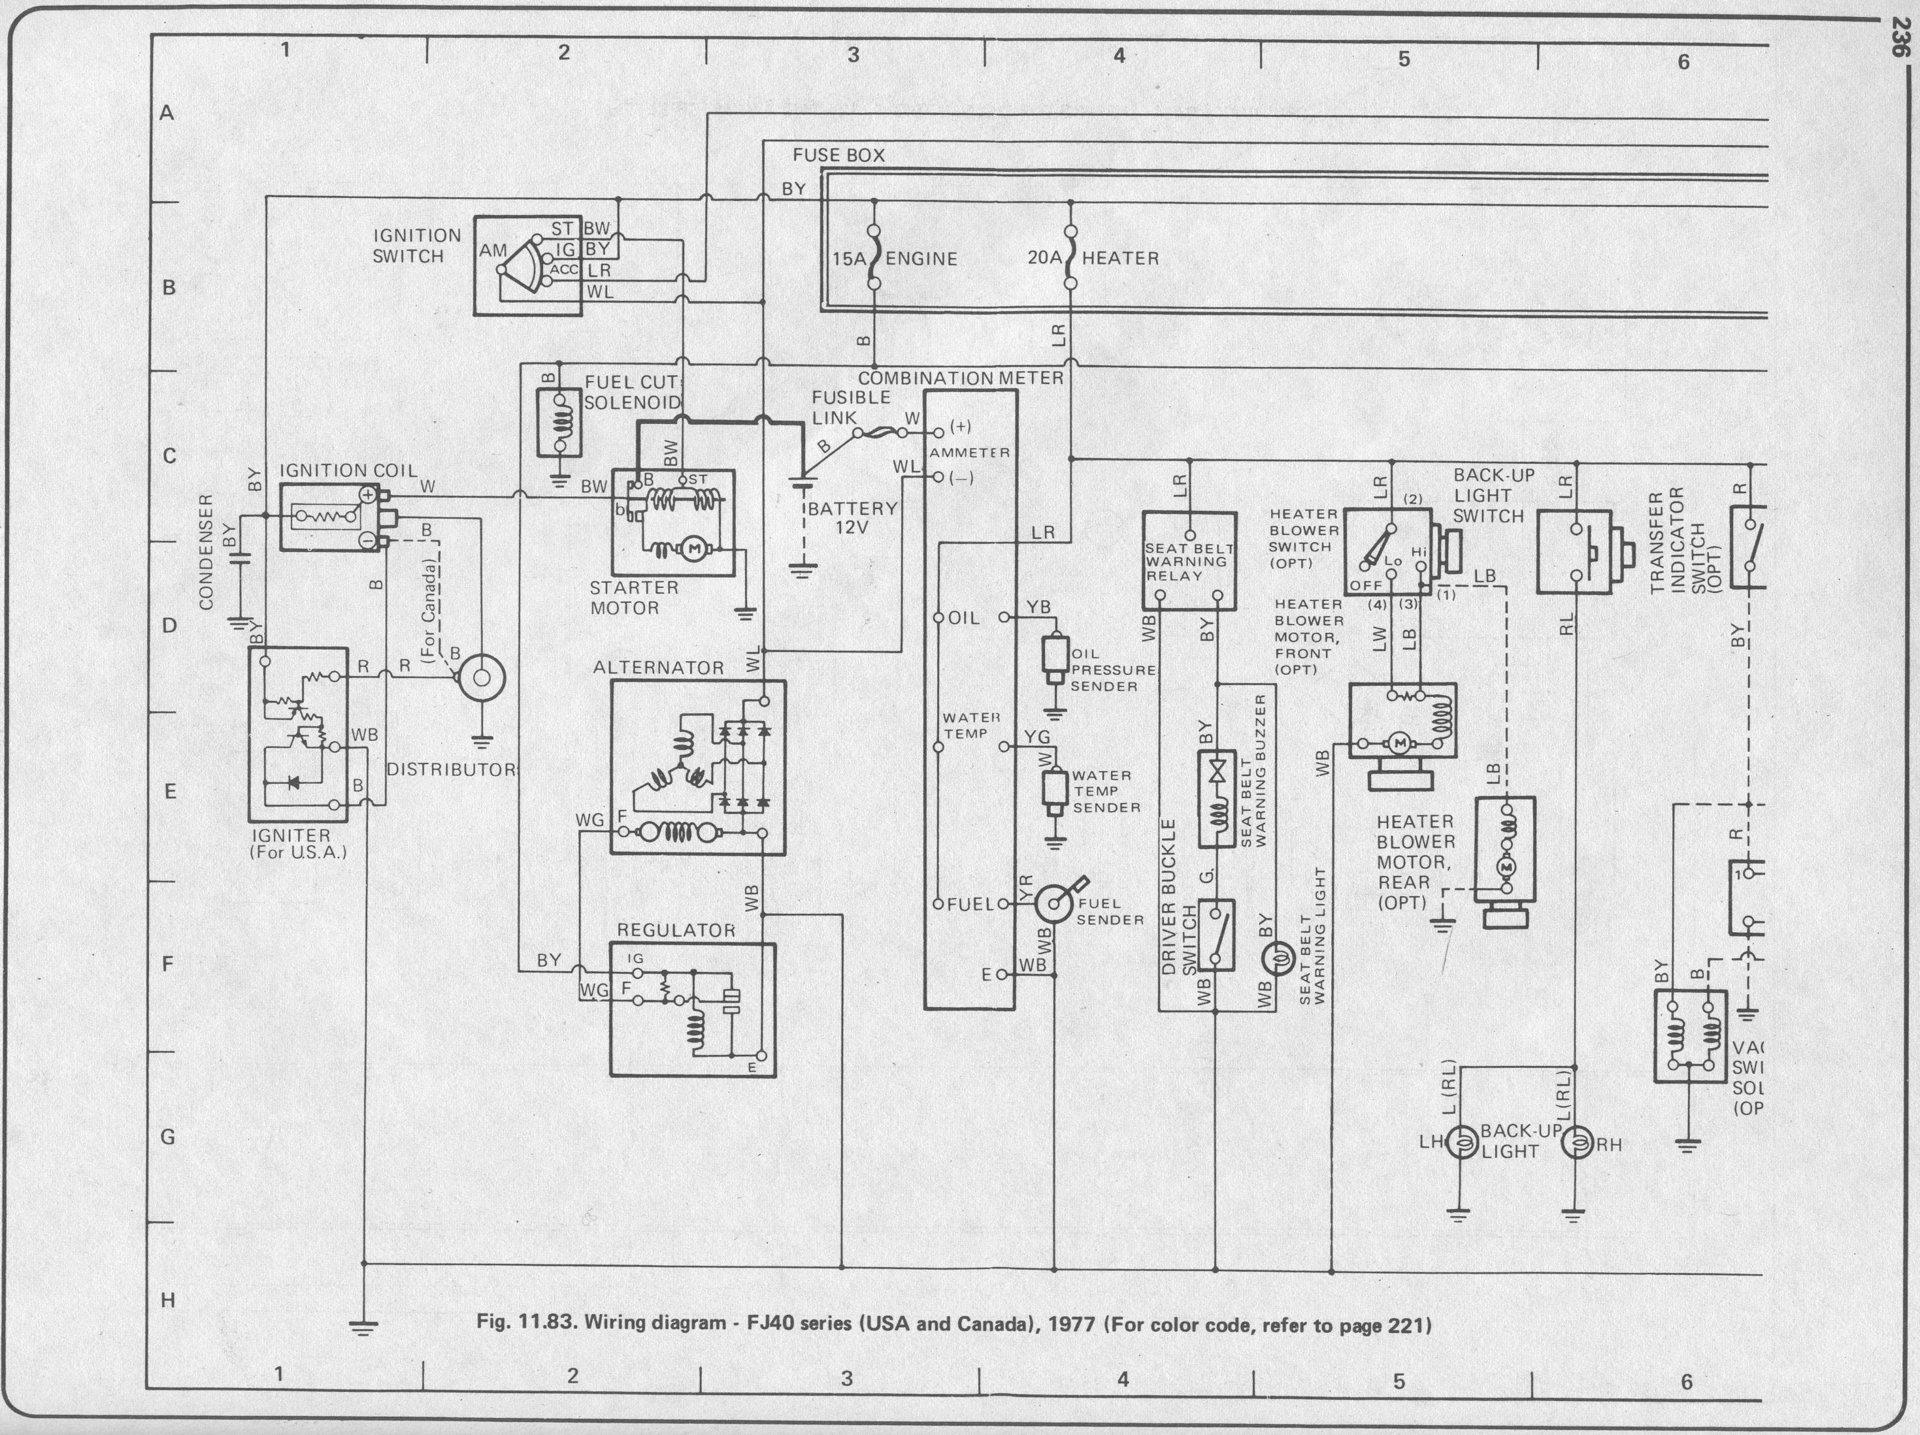 1977 fj40 wiring diagram sunflower plant life cycle voltage regulator and alternator ih8mud forum